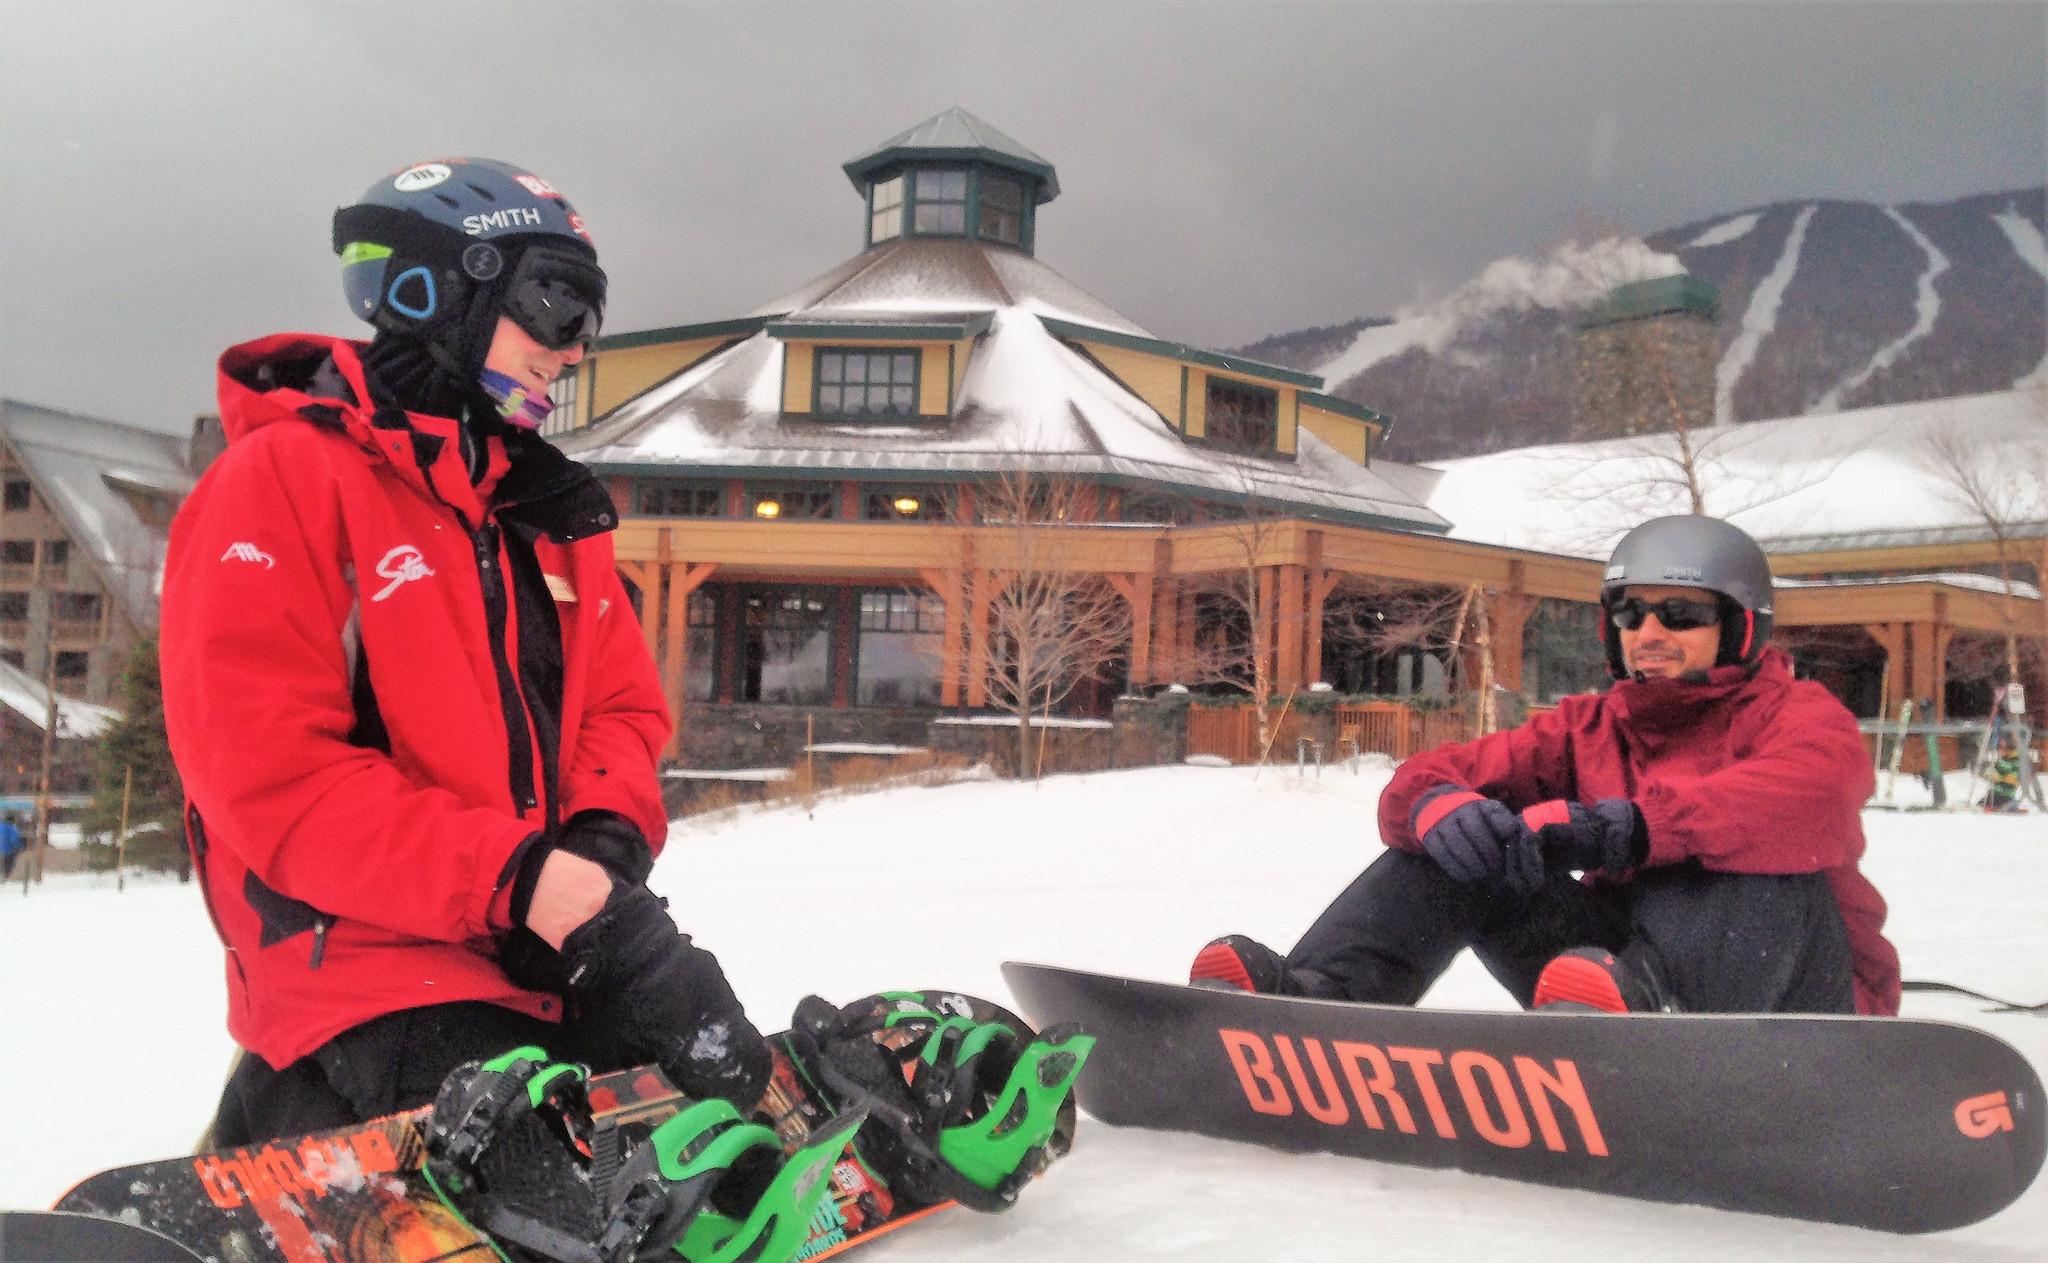 snowboarding school for adults - Stowe Ski Resort